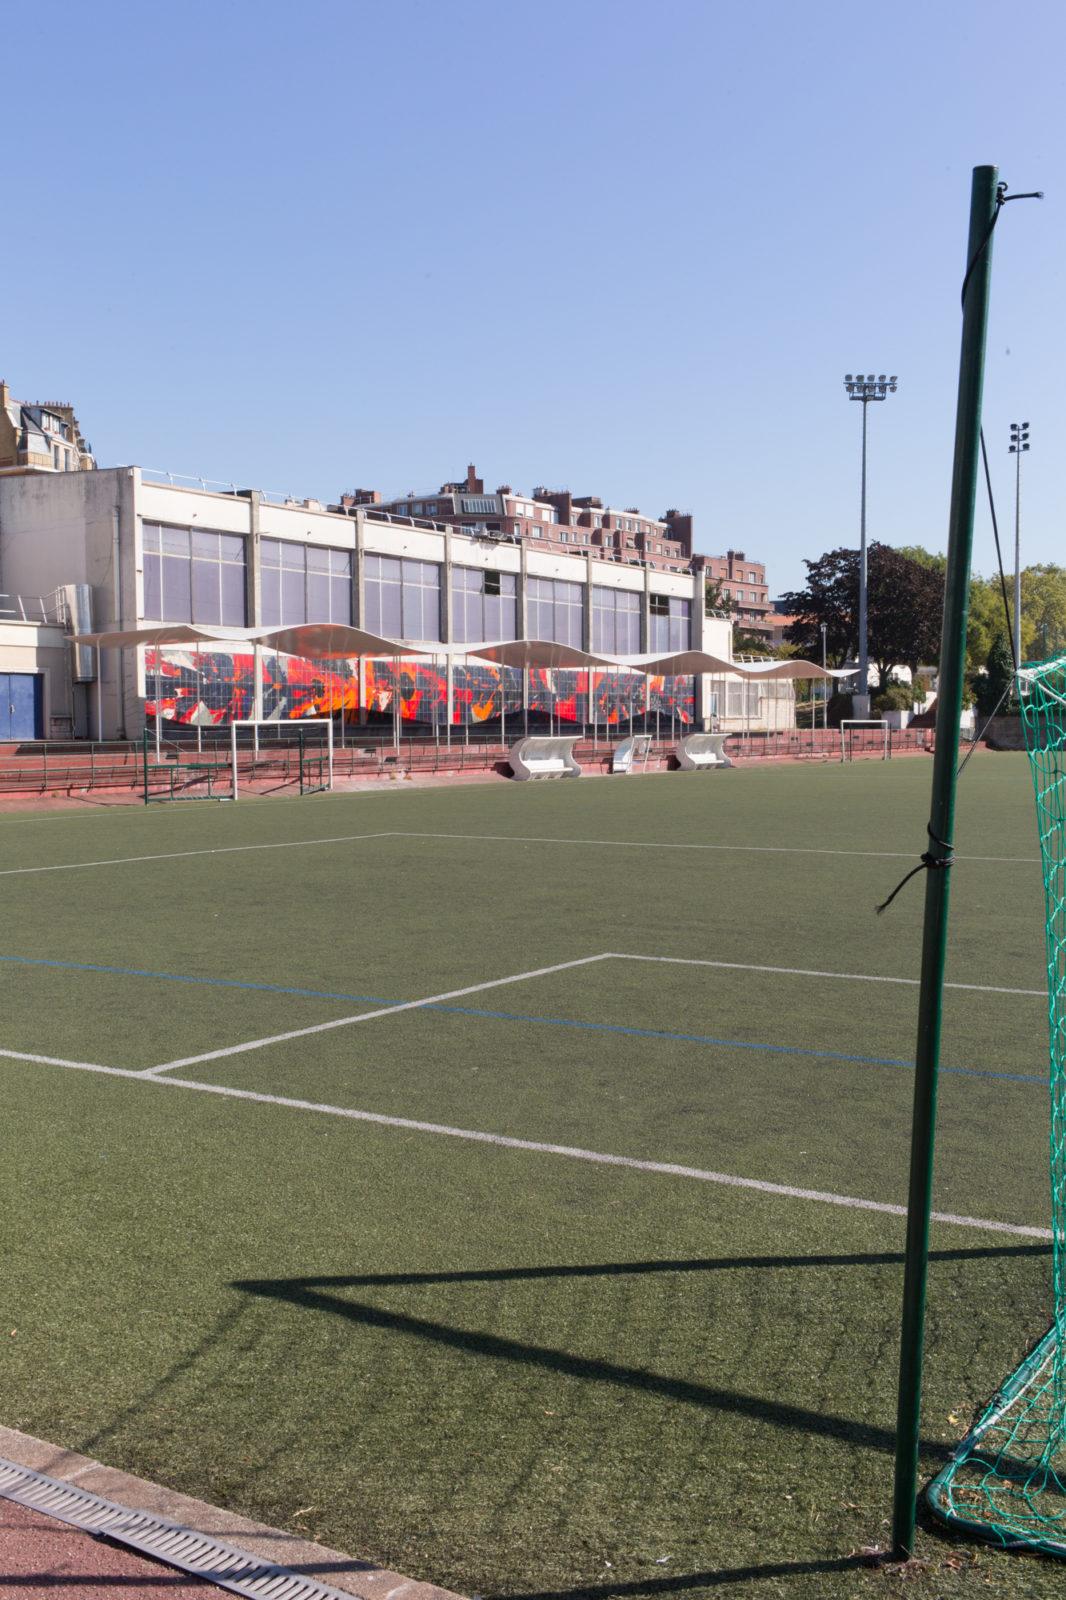 Severine-stade-auventsept-ld-55